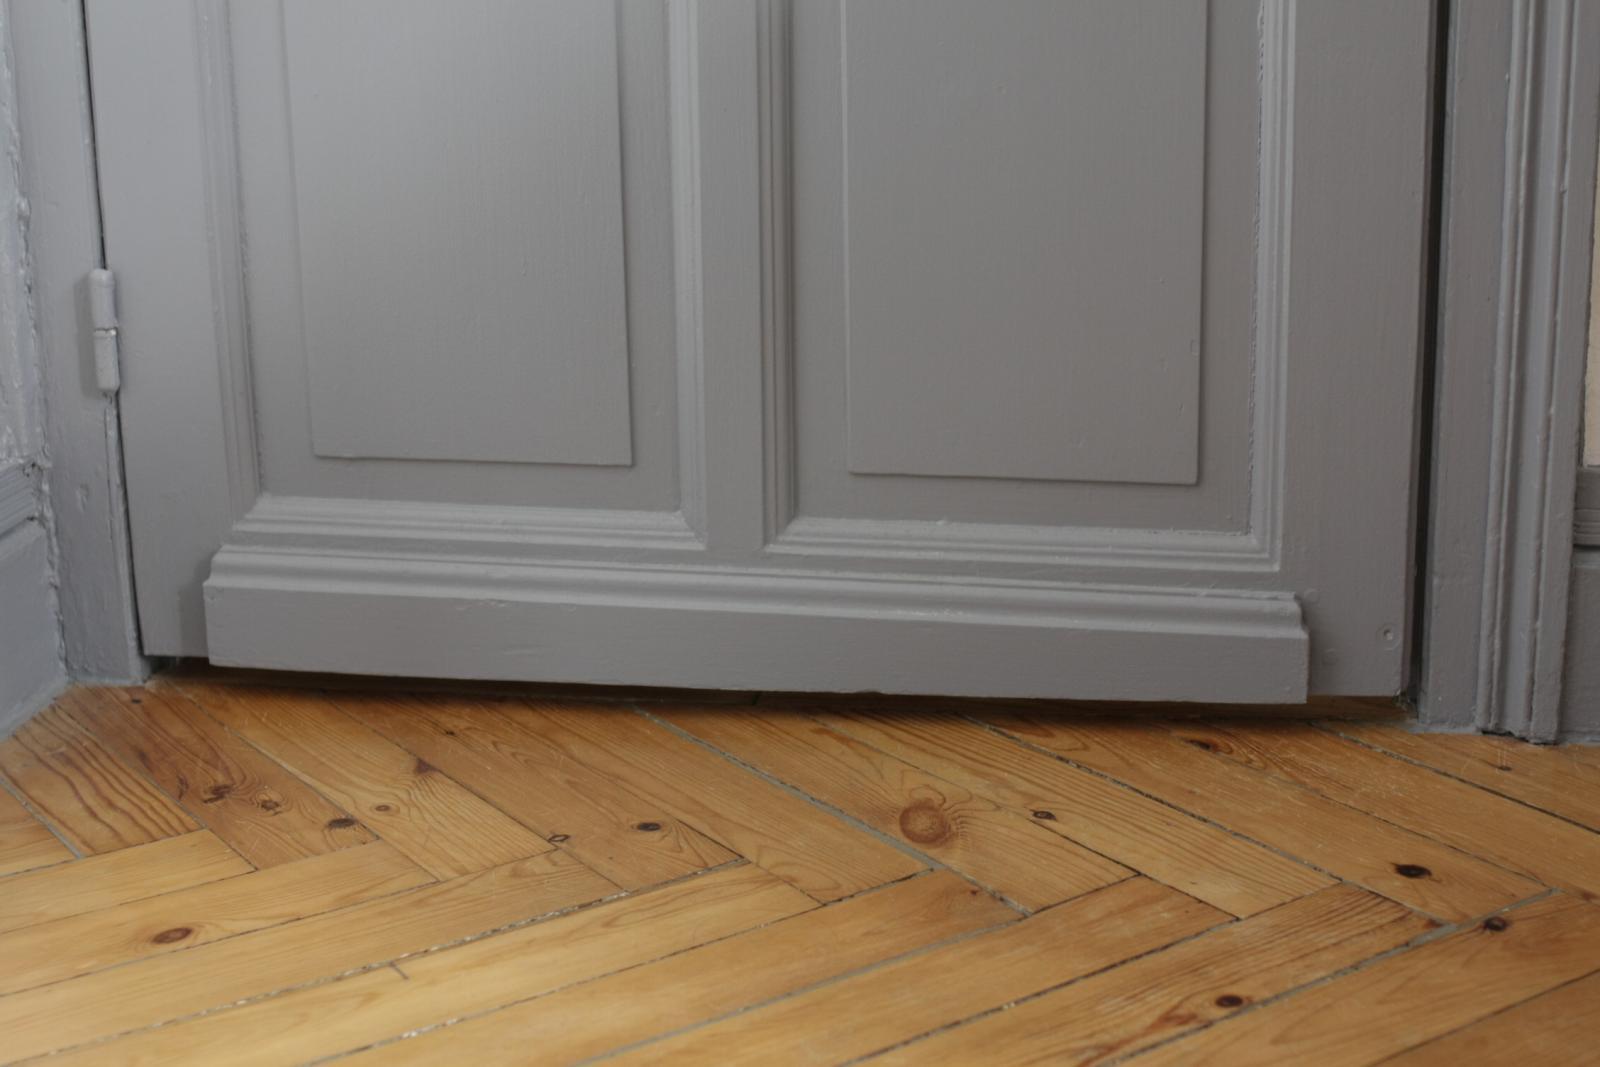 isolation phonique porte. Black Bedroom Furniture Sets. Home Design Ideas